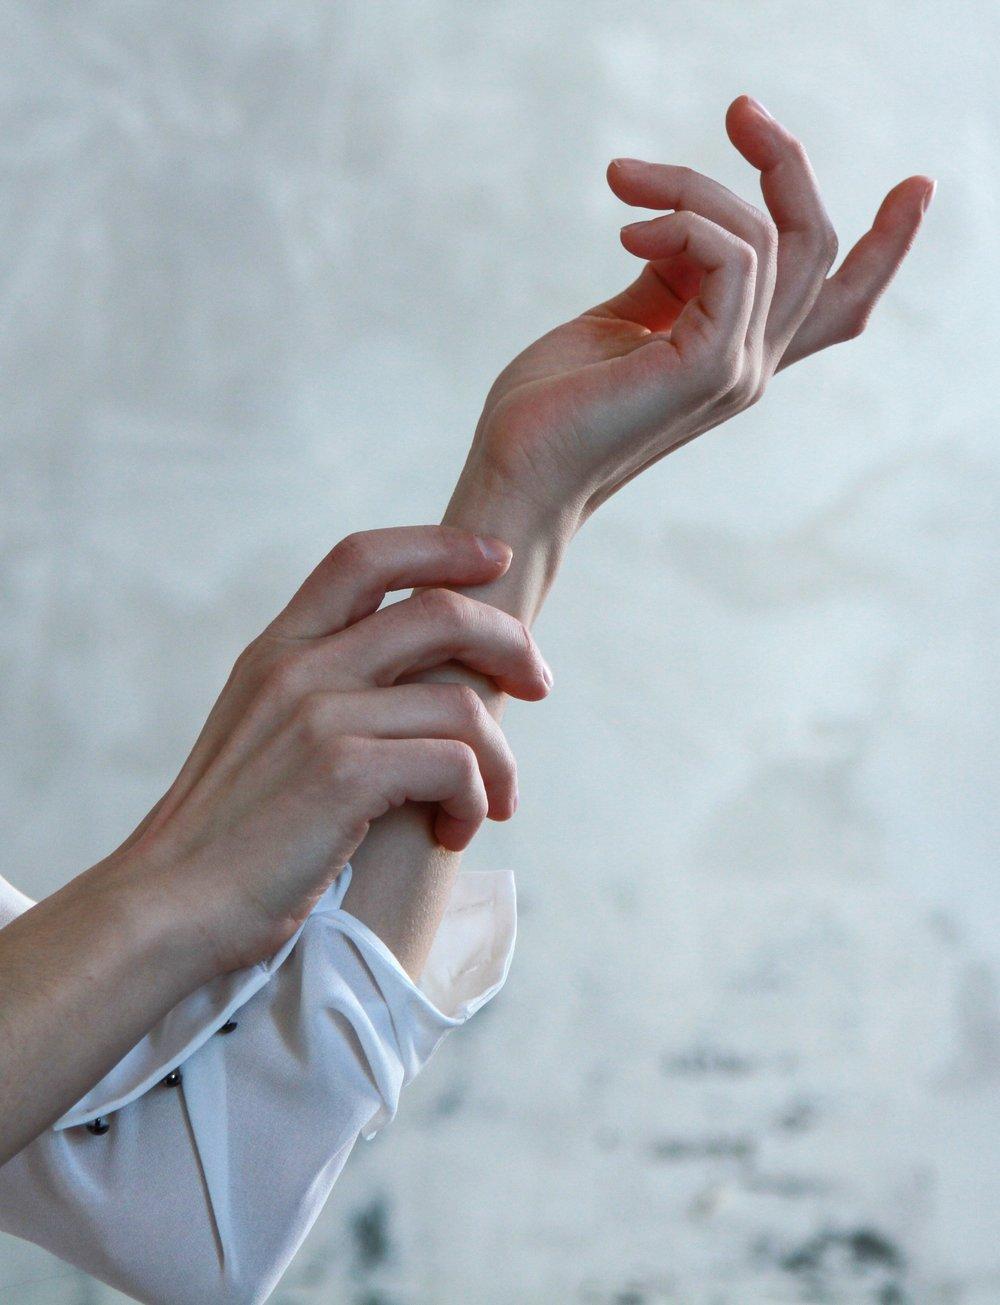 blurred-background-fingers-hands-951572.jpg